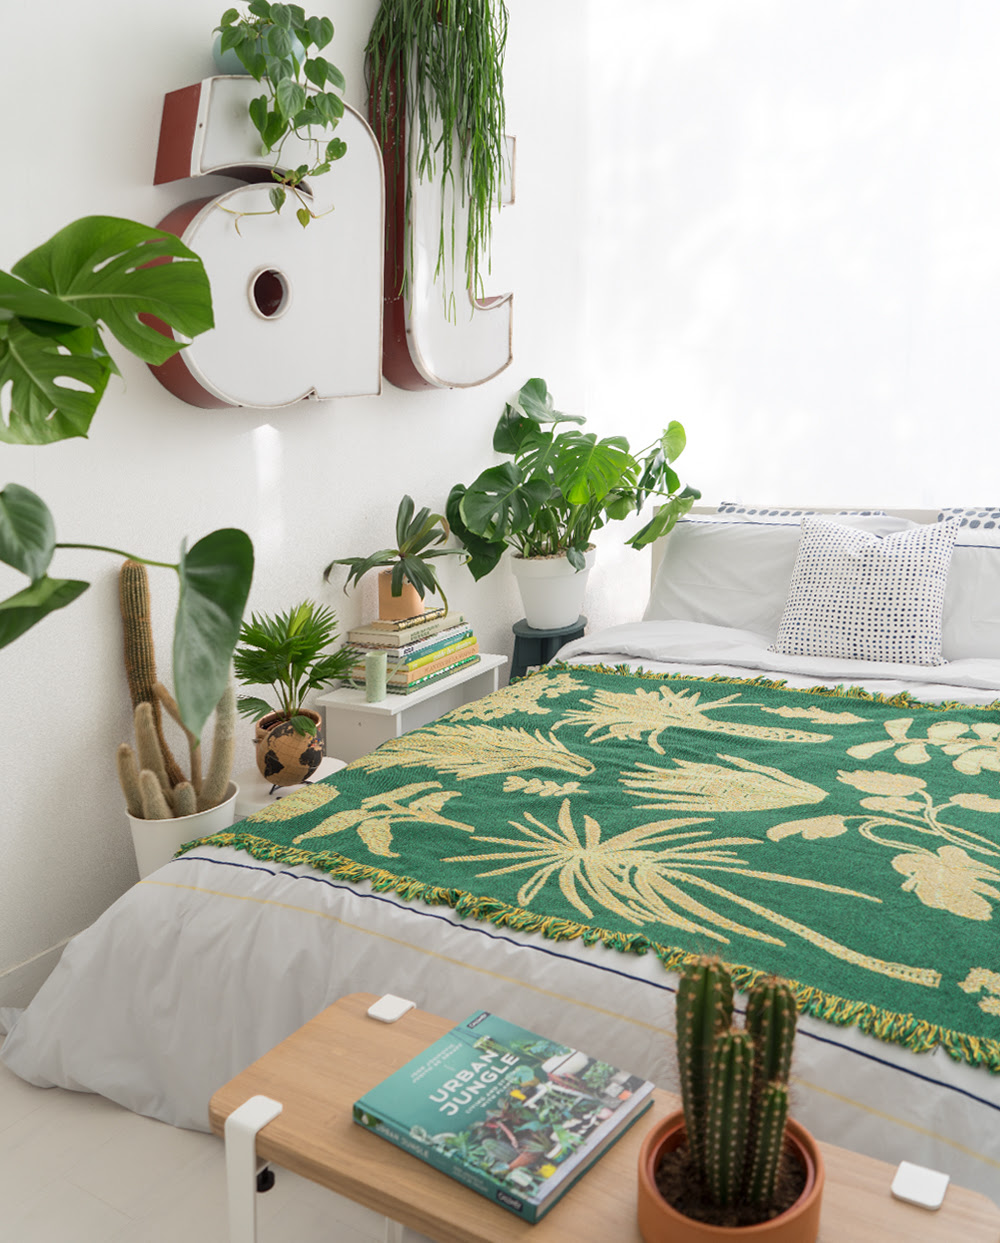 https://www.urbanjunglebloggers.com. Sleeping with plants